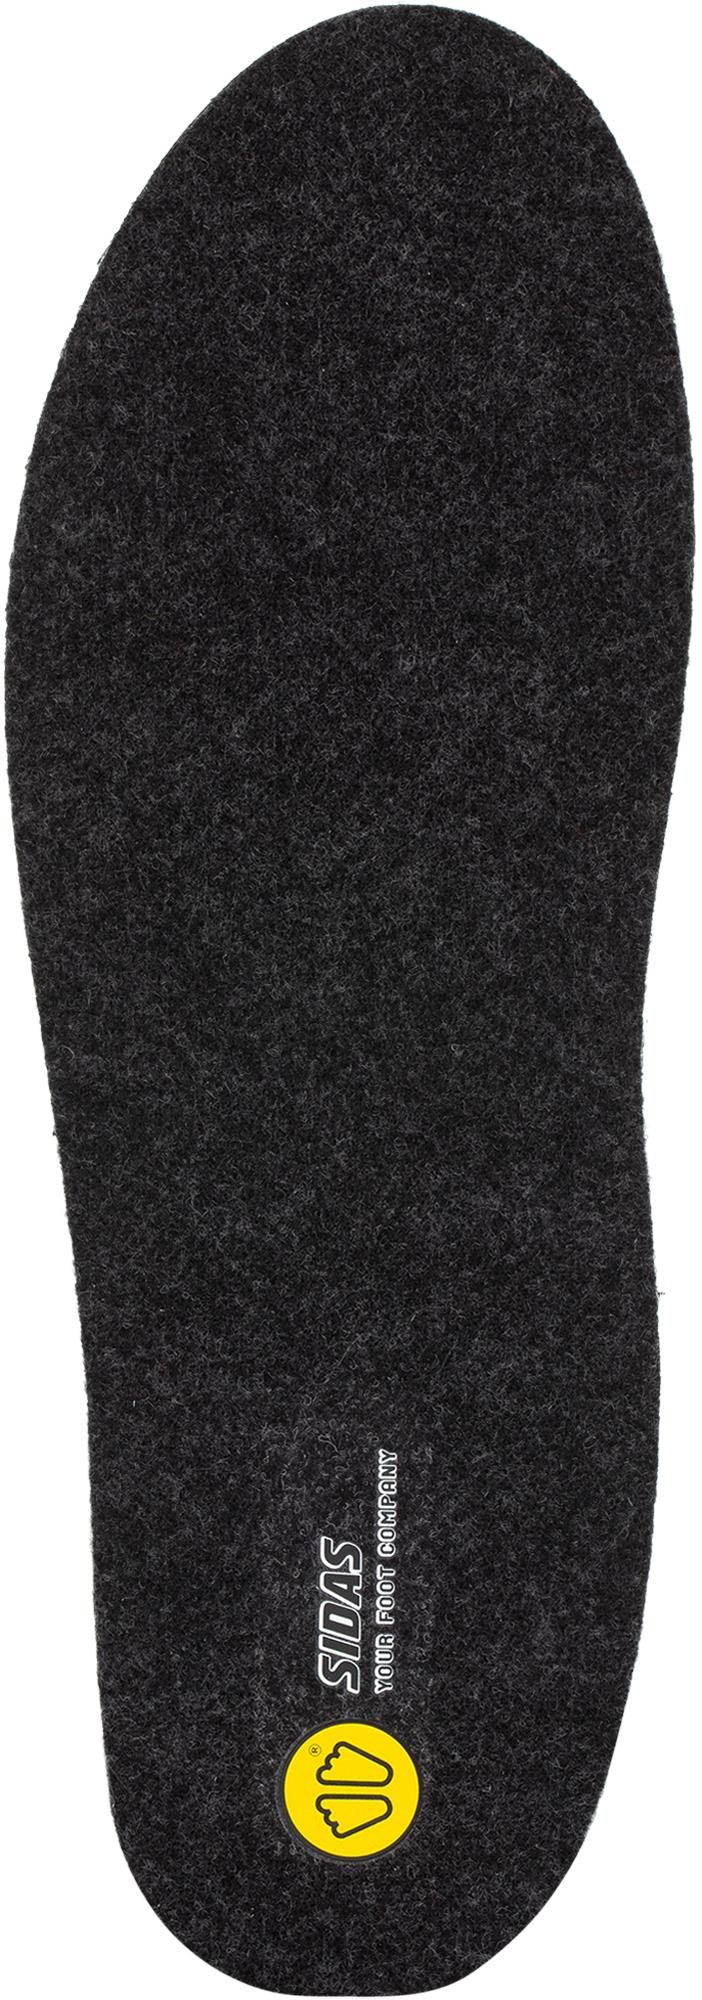 Sidas Стельки Custom Comfort Merino, размер 46-48